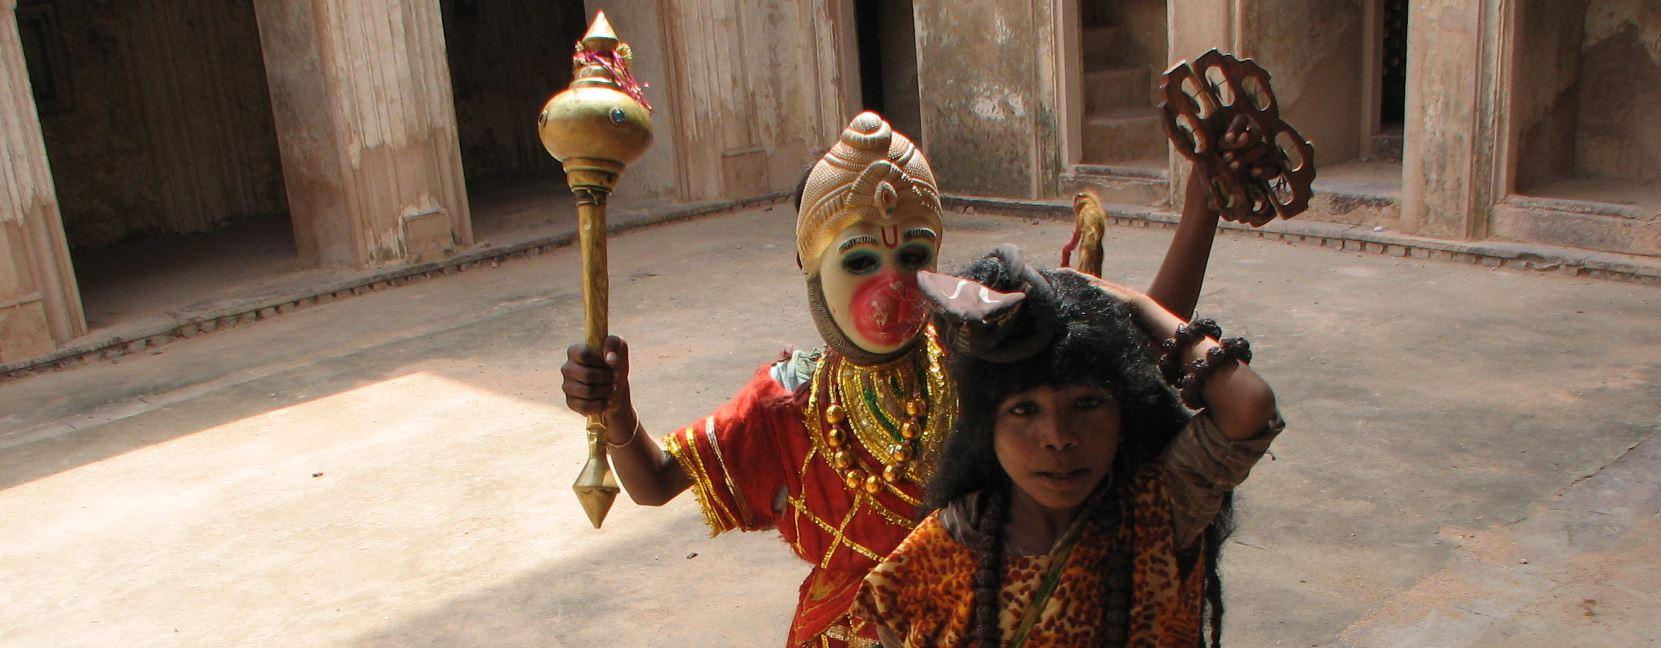 hanuman théâtre enfant Rajasthan